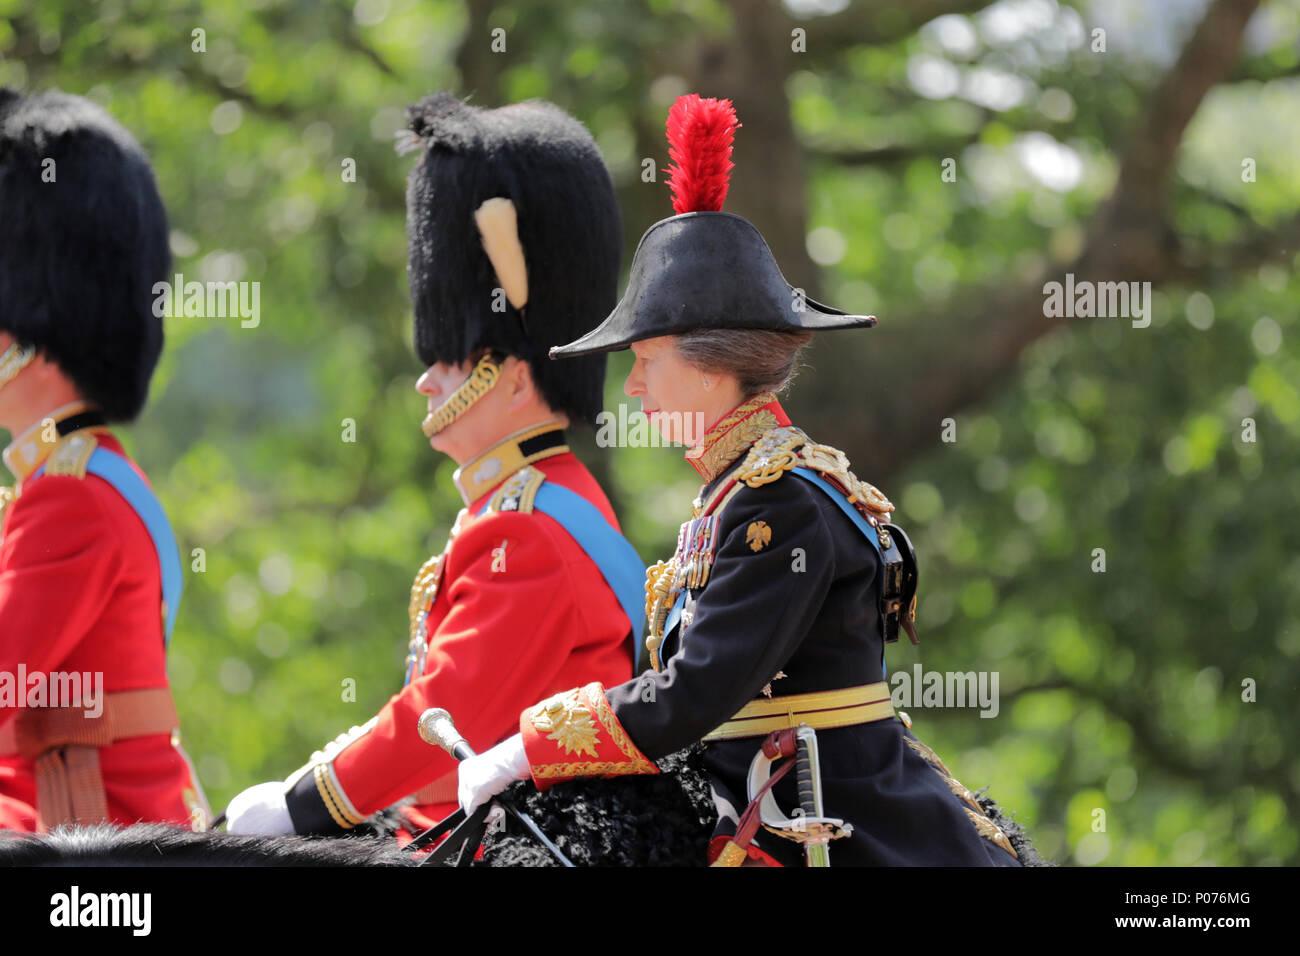 London, UK, 9 June 2018.  HRH Princess Anne, The Princess Royal, on Horseback,Trooping the Colour Credit: amanda rose/Alamy Live News Credit: amanda rose/Alamy Live News Stock Photo